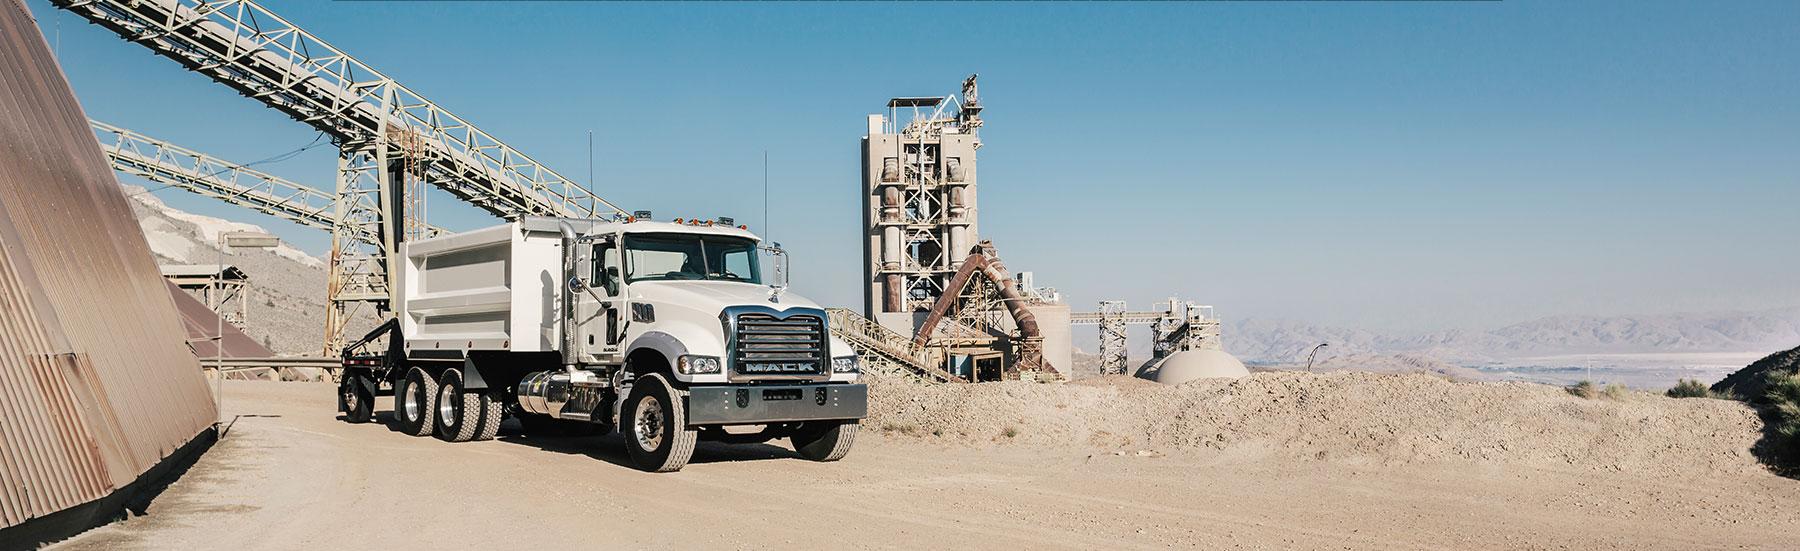 Diesel Laptops Support Photo Trend Ideas Mack Truck Wiring Harness Semi Engines Trucks Meyers Manx T800 Engine Diagram